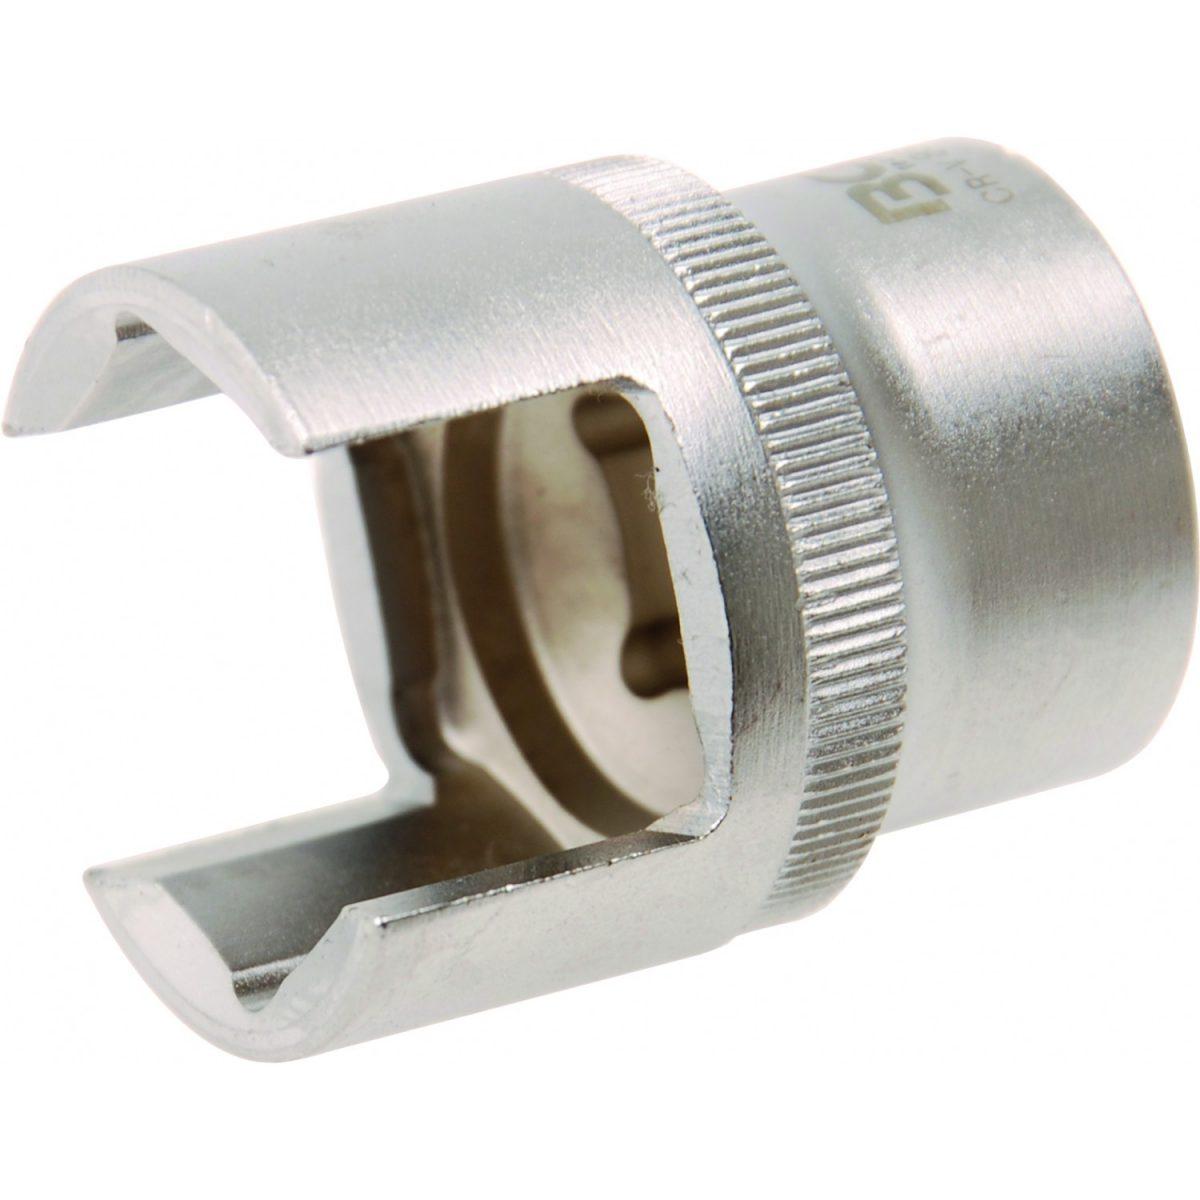 Special Socket for Diesel Filters | 27 mm(8630)